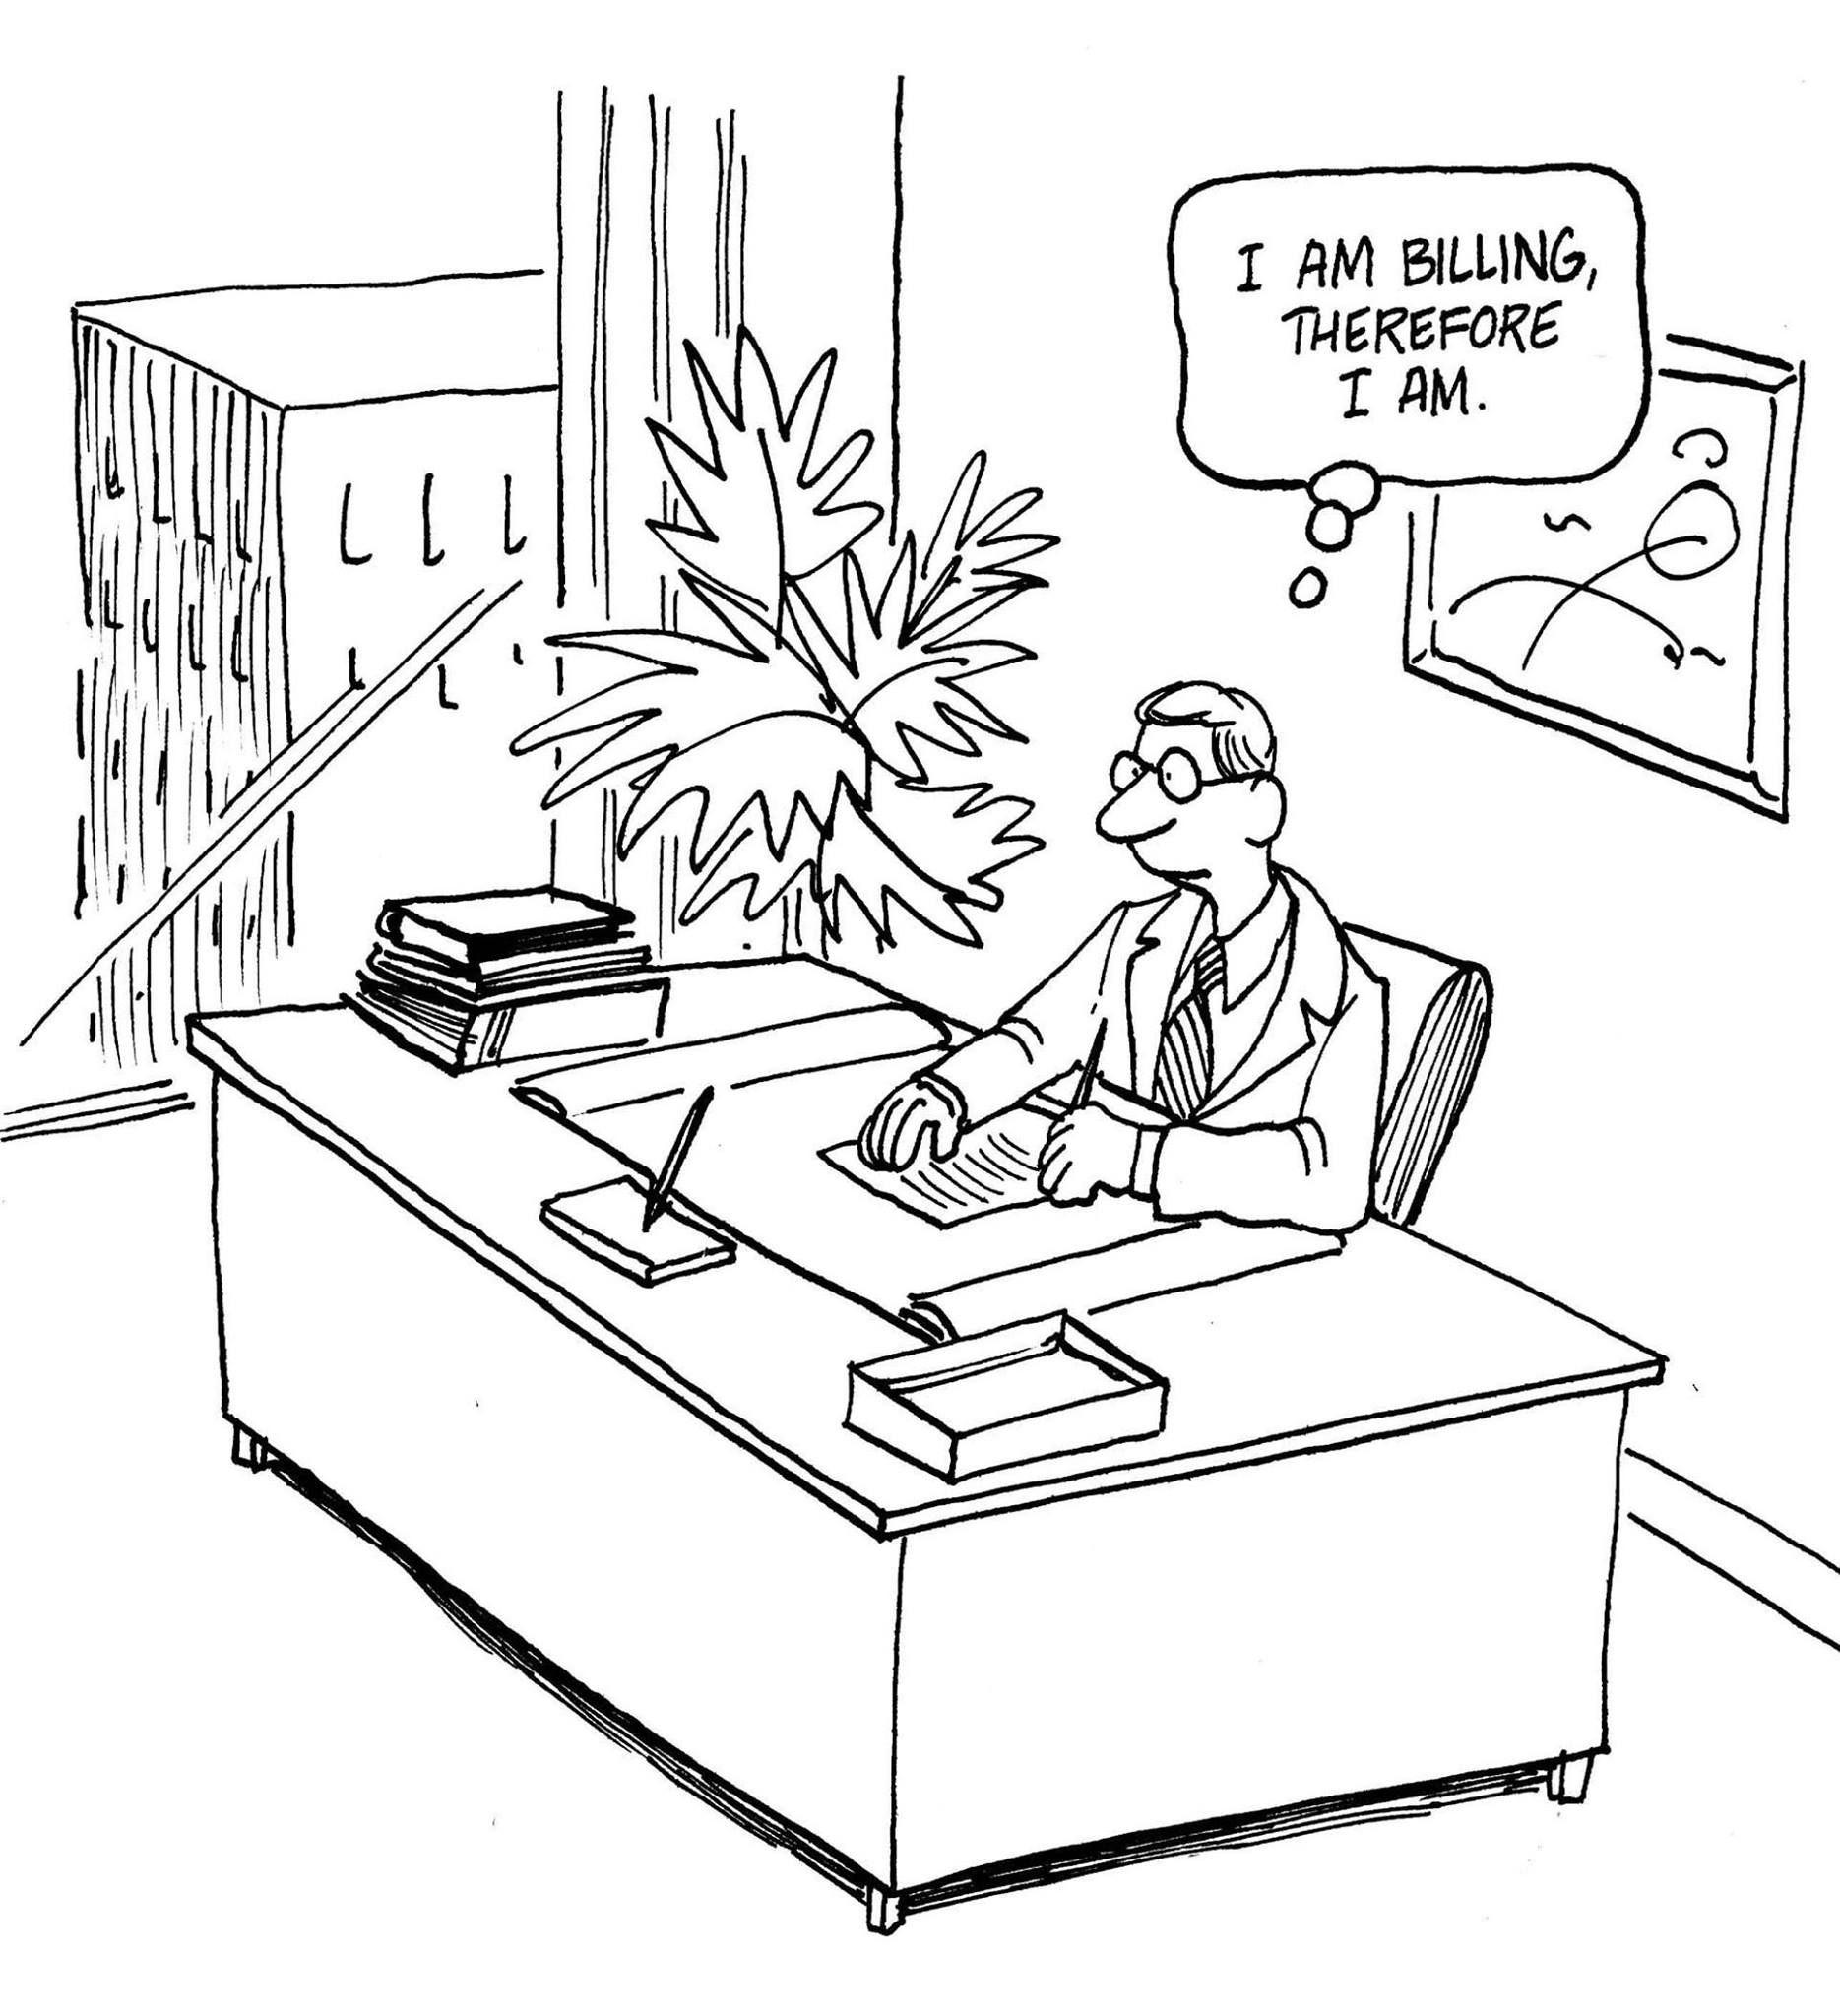 Law funny lawhumor legal law Legal Humor